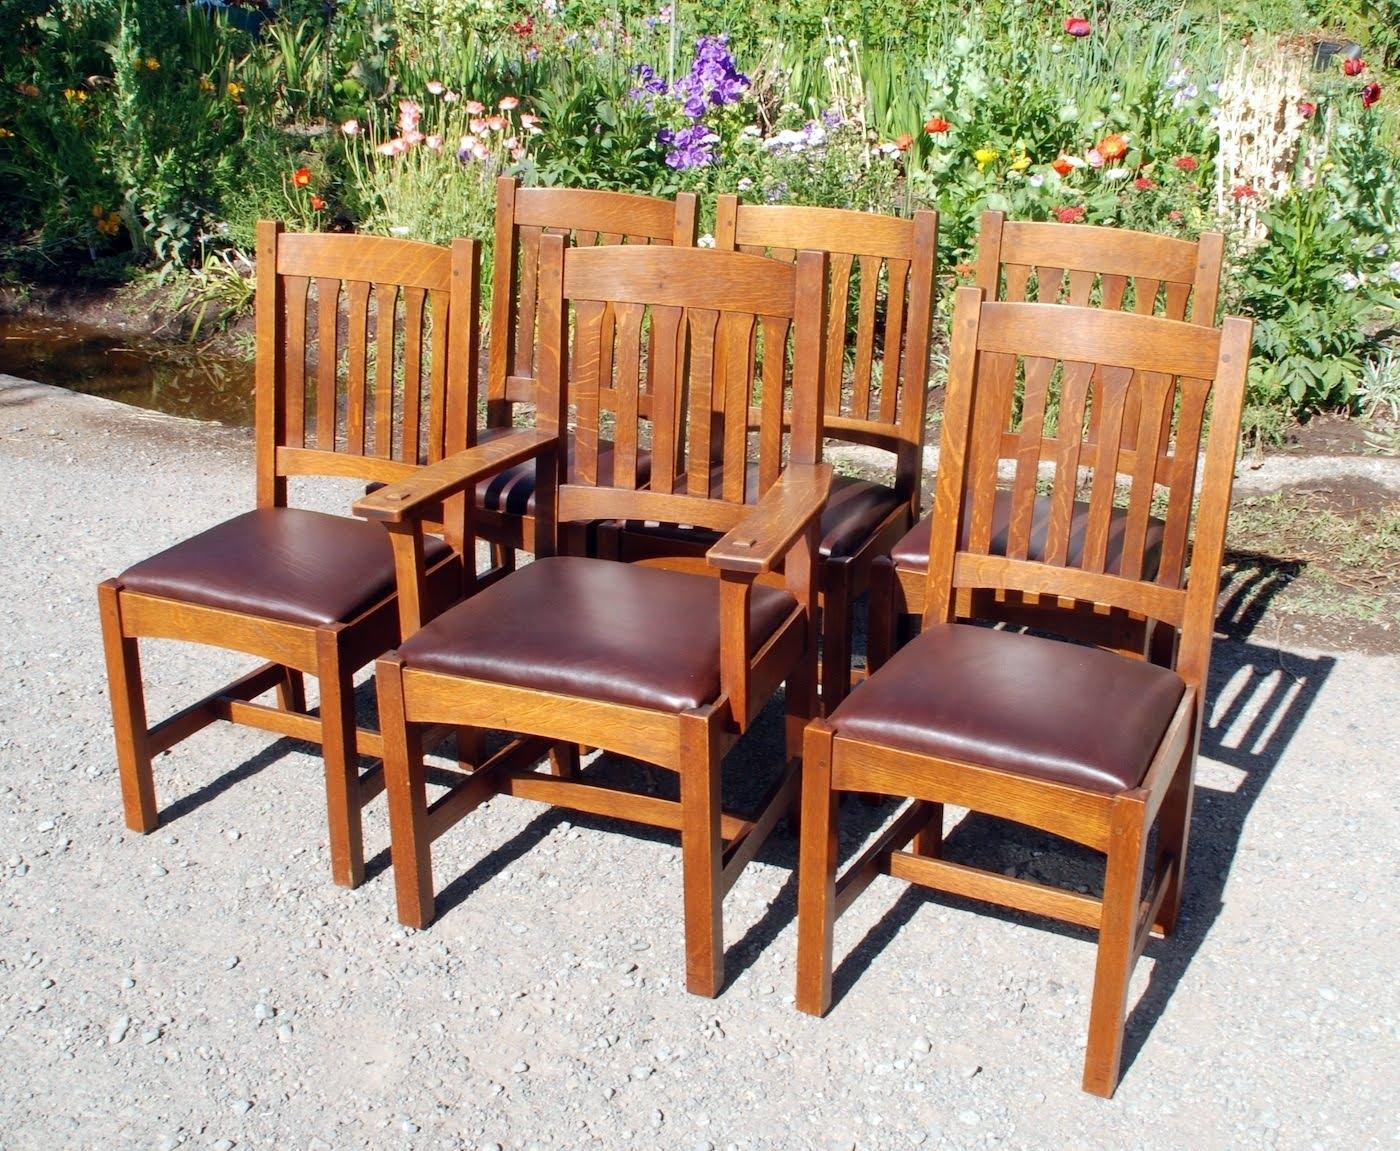 2019 Craftsman Side Chairs Intended For Voorhees Craftsman Mission Oak Furniture – Set Of 6 Original L (#1 of 20)